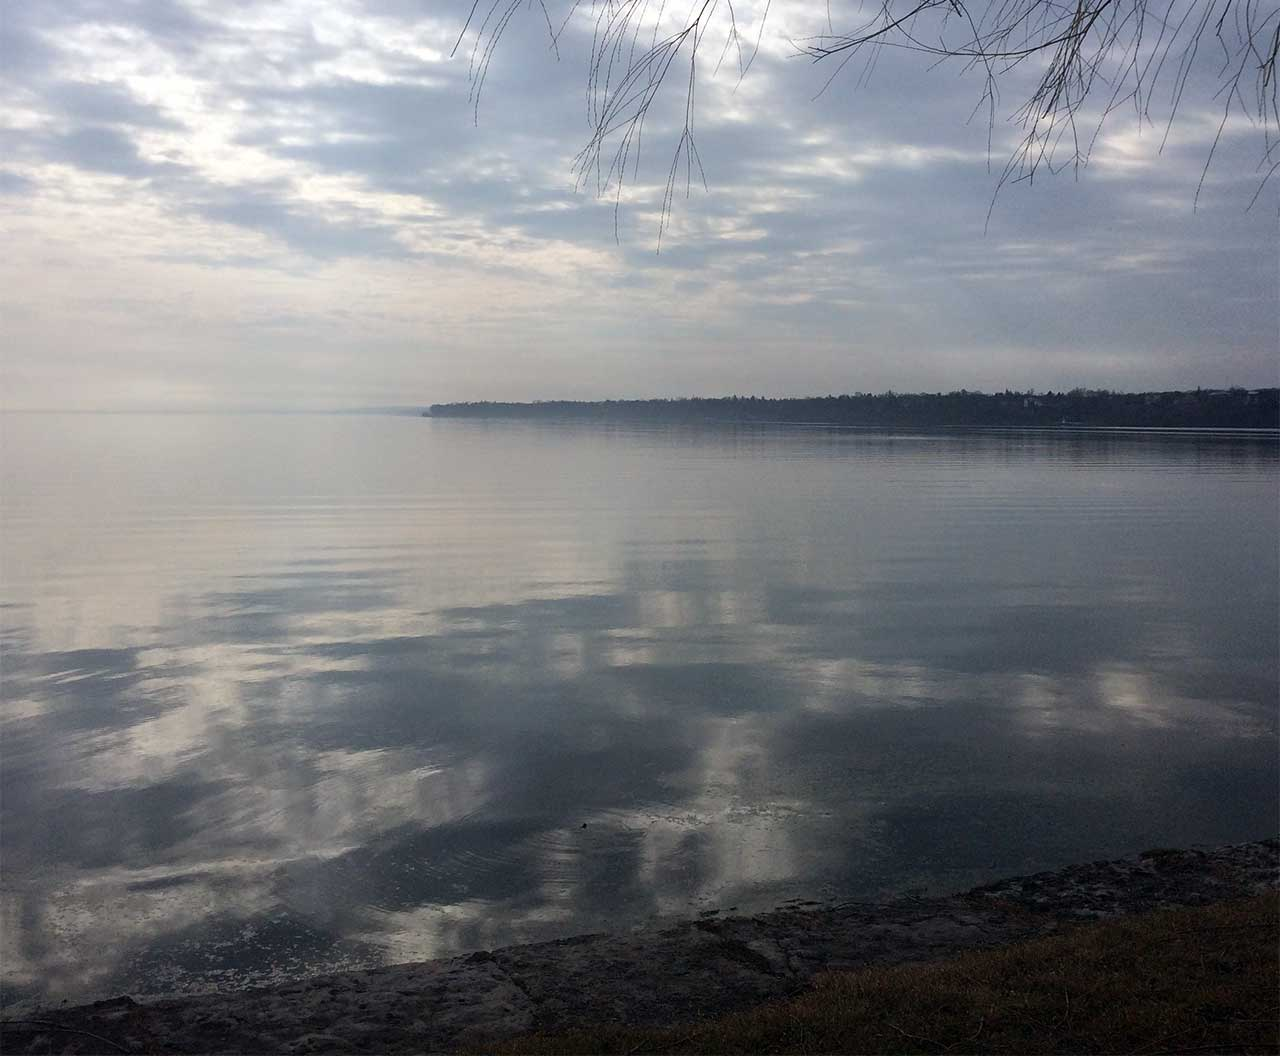 Fog and mirrors on Seneca Lake in Geneva (photo)